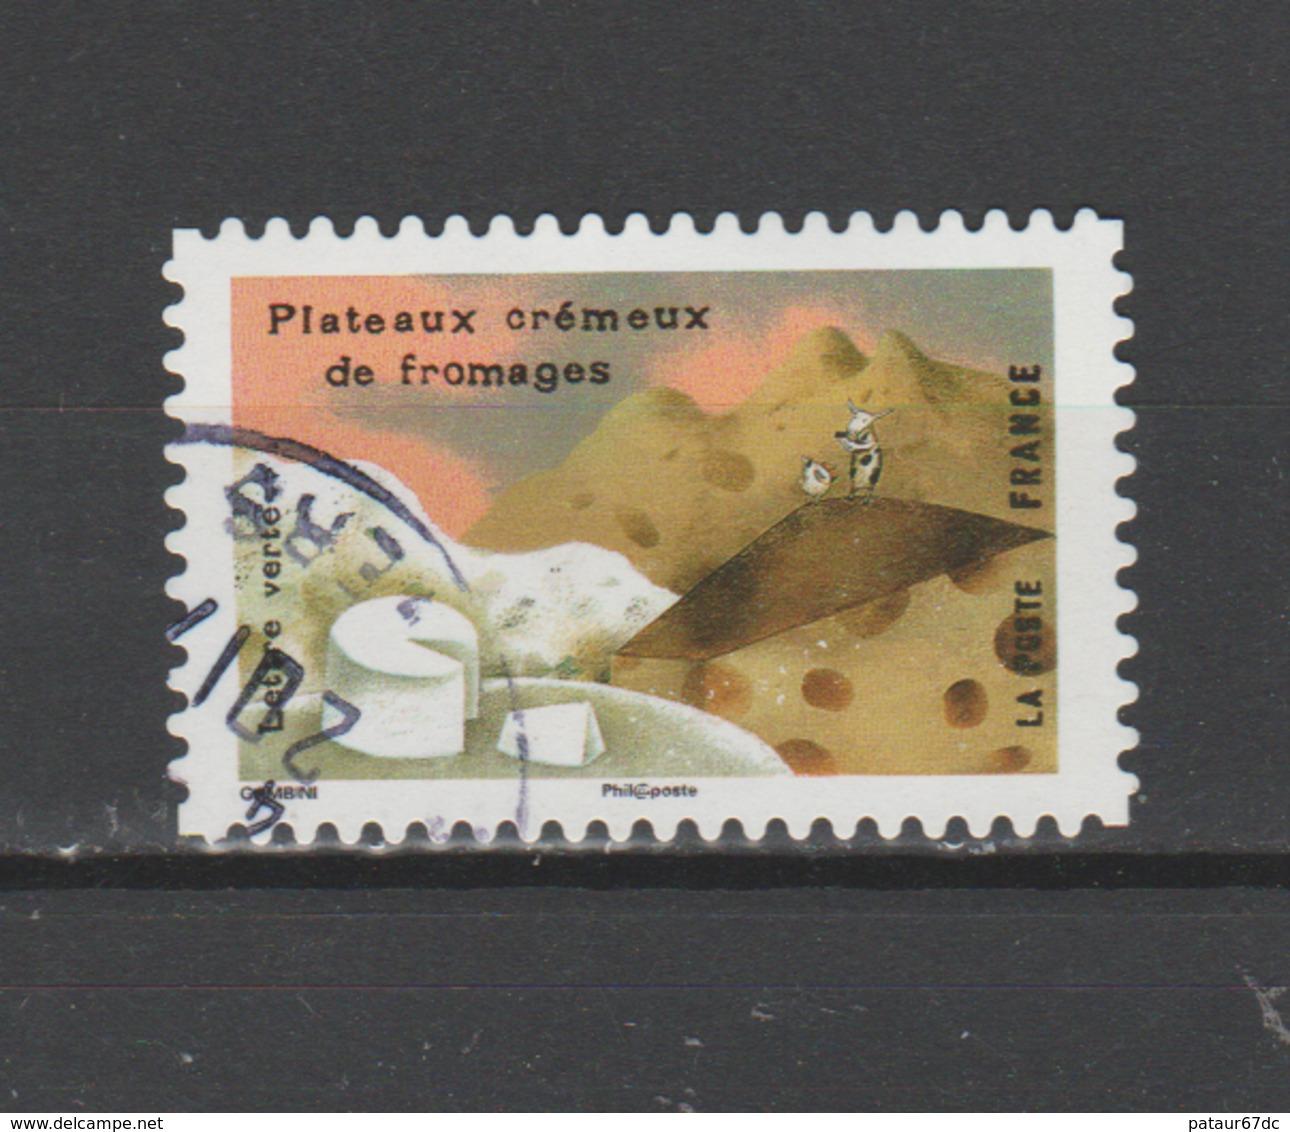 FRANCE / 2017 / Y&T N° AA 1461 - Oblitération De 2017. SUPERBE ! - Sellos Autoadhesivos